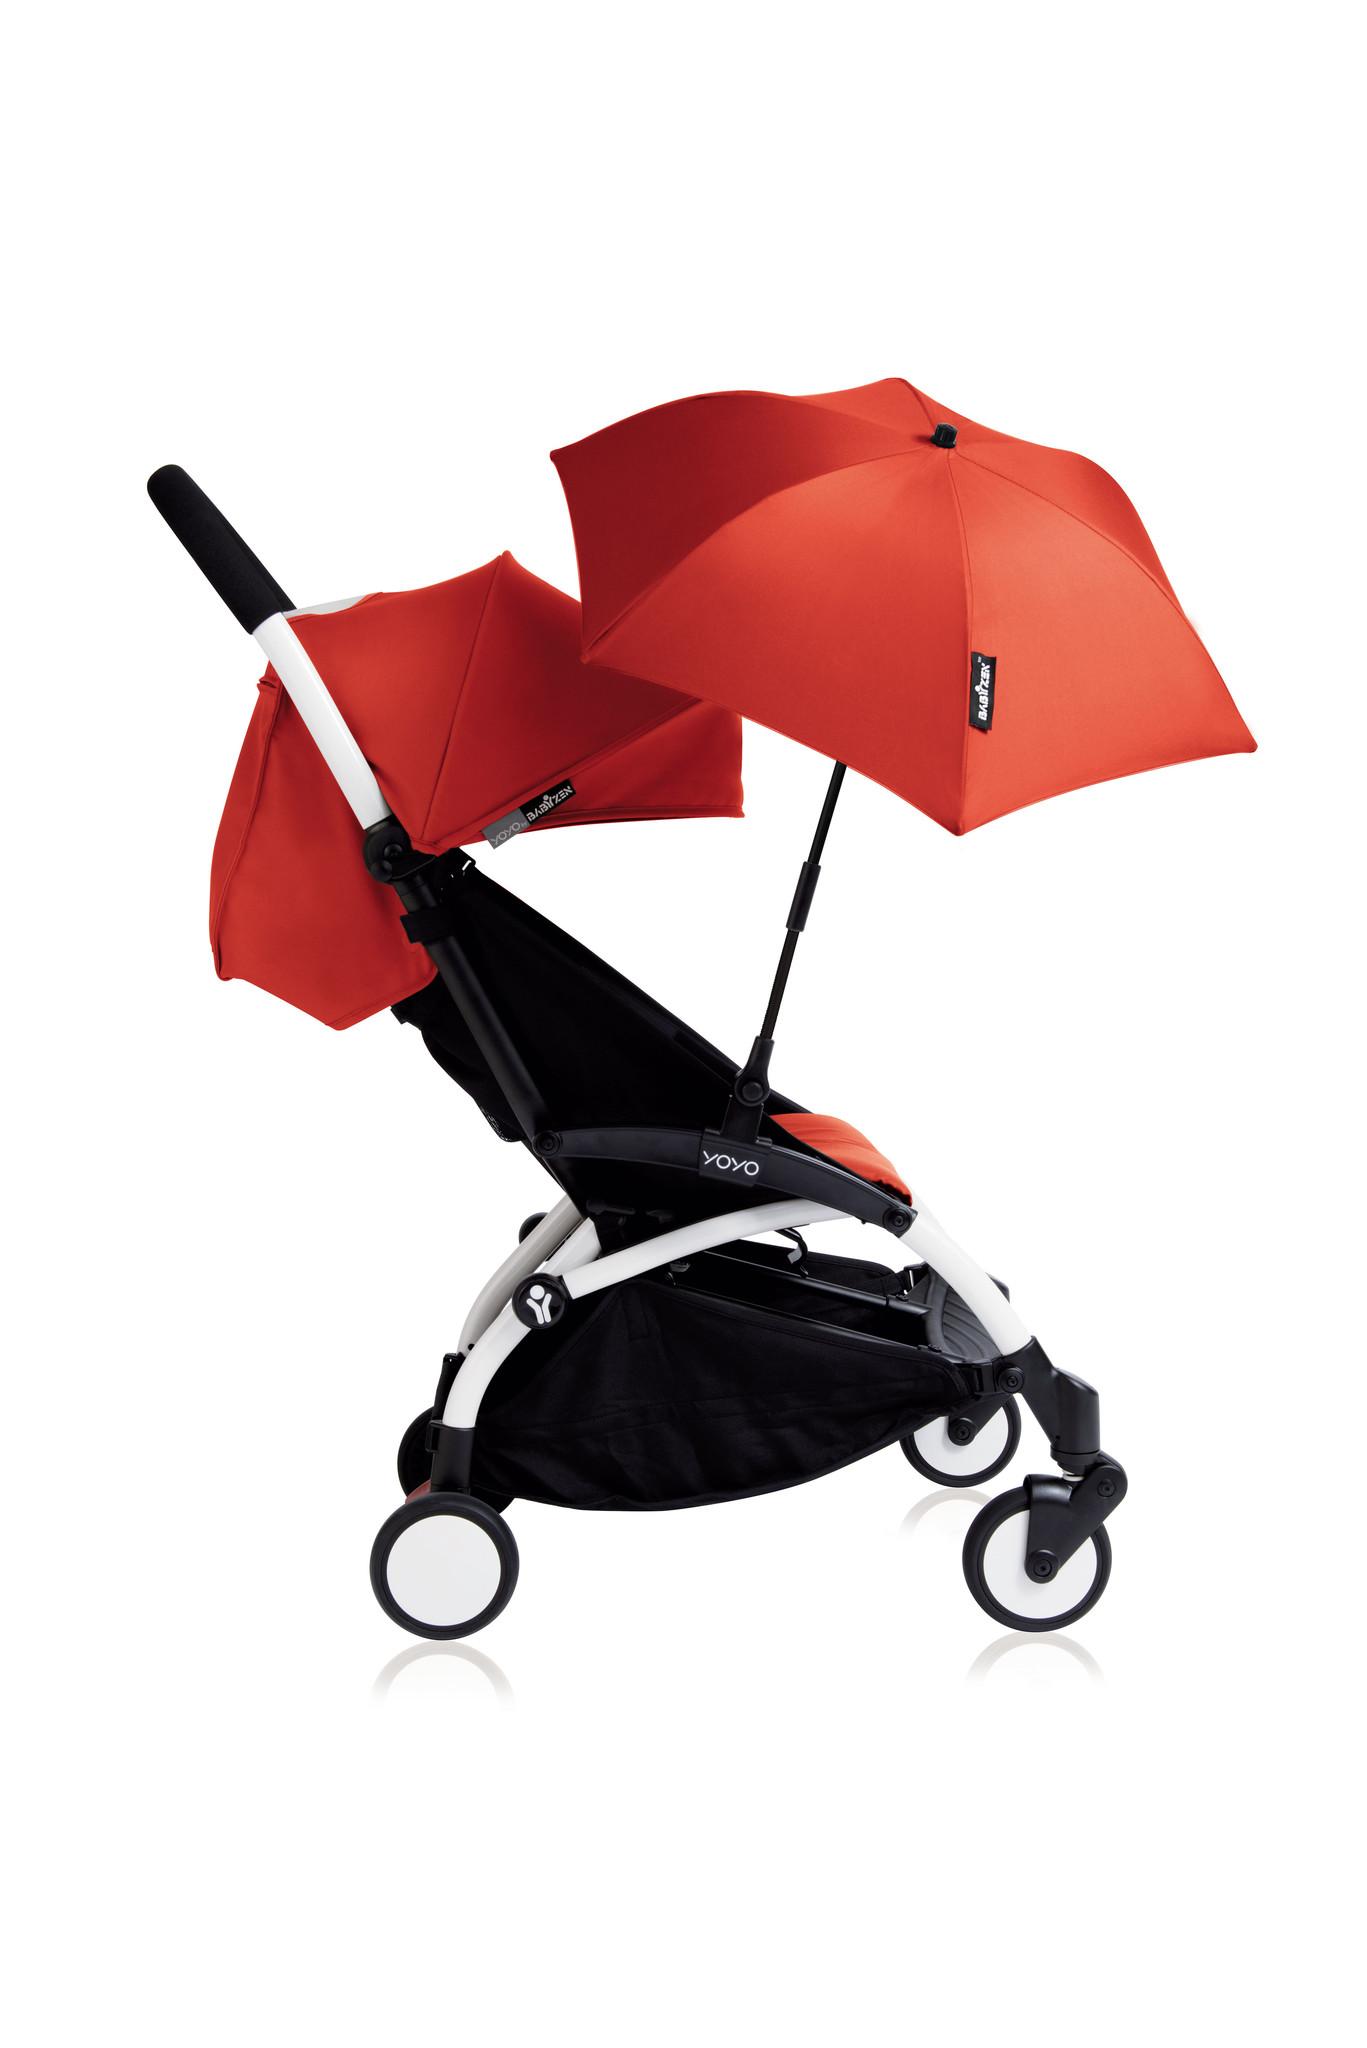 Babyzen Babyzen Yoyo Parasol red / rood